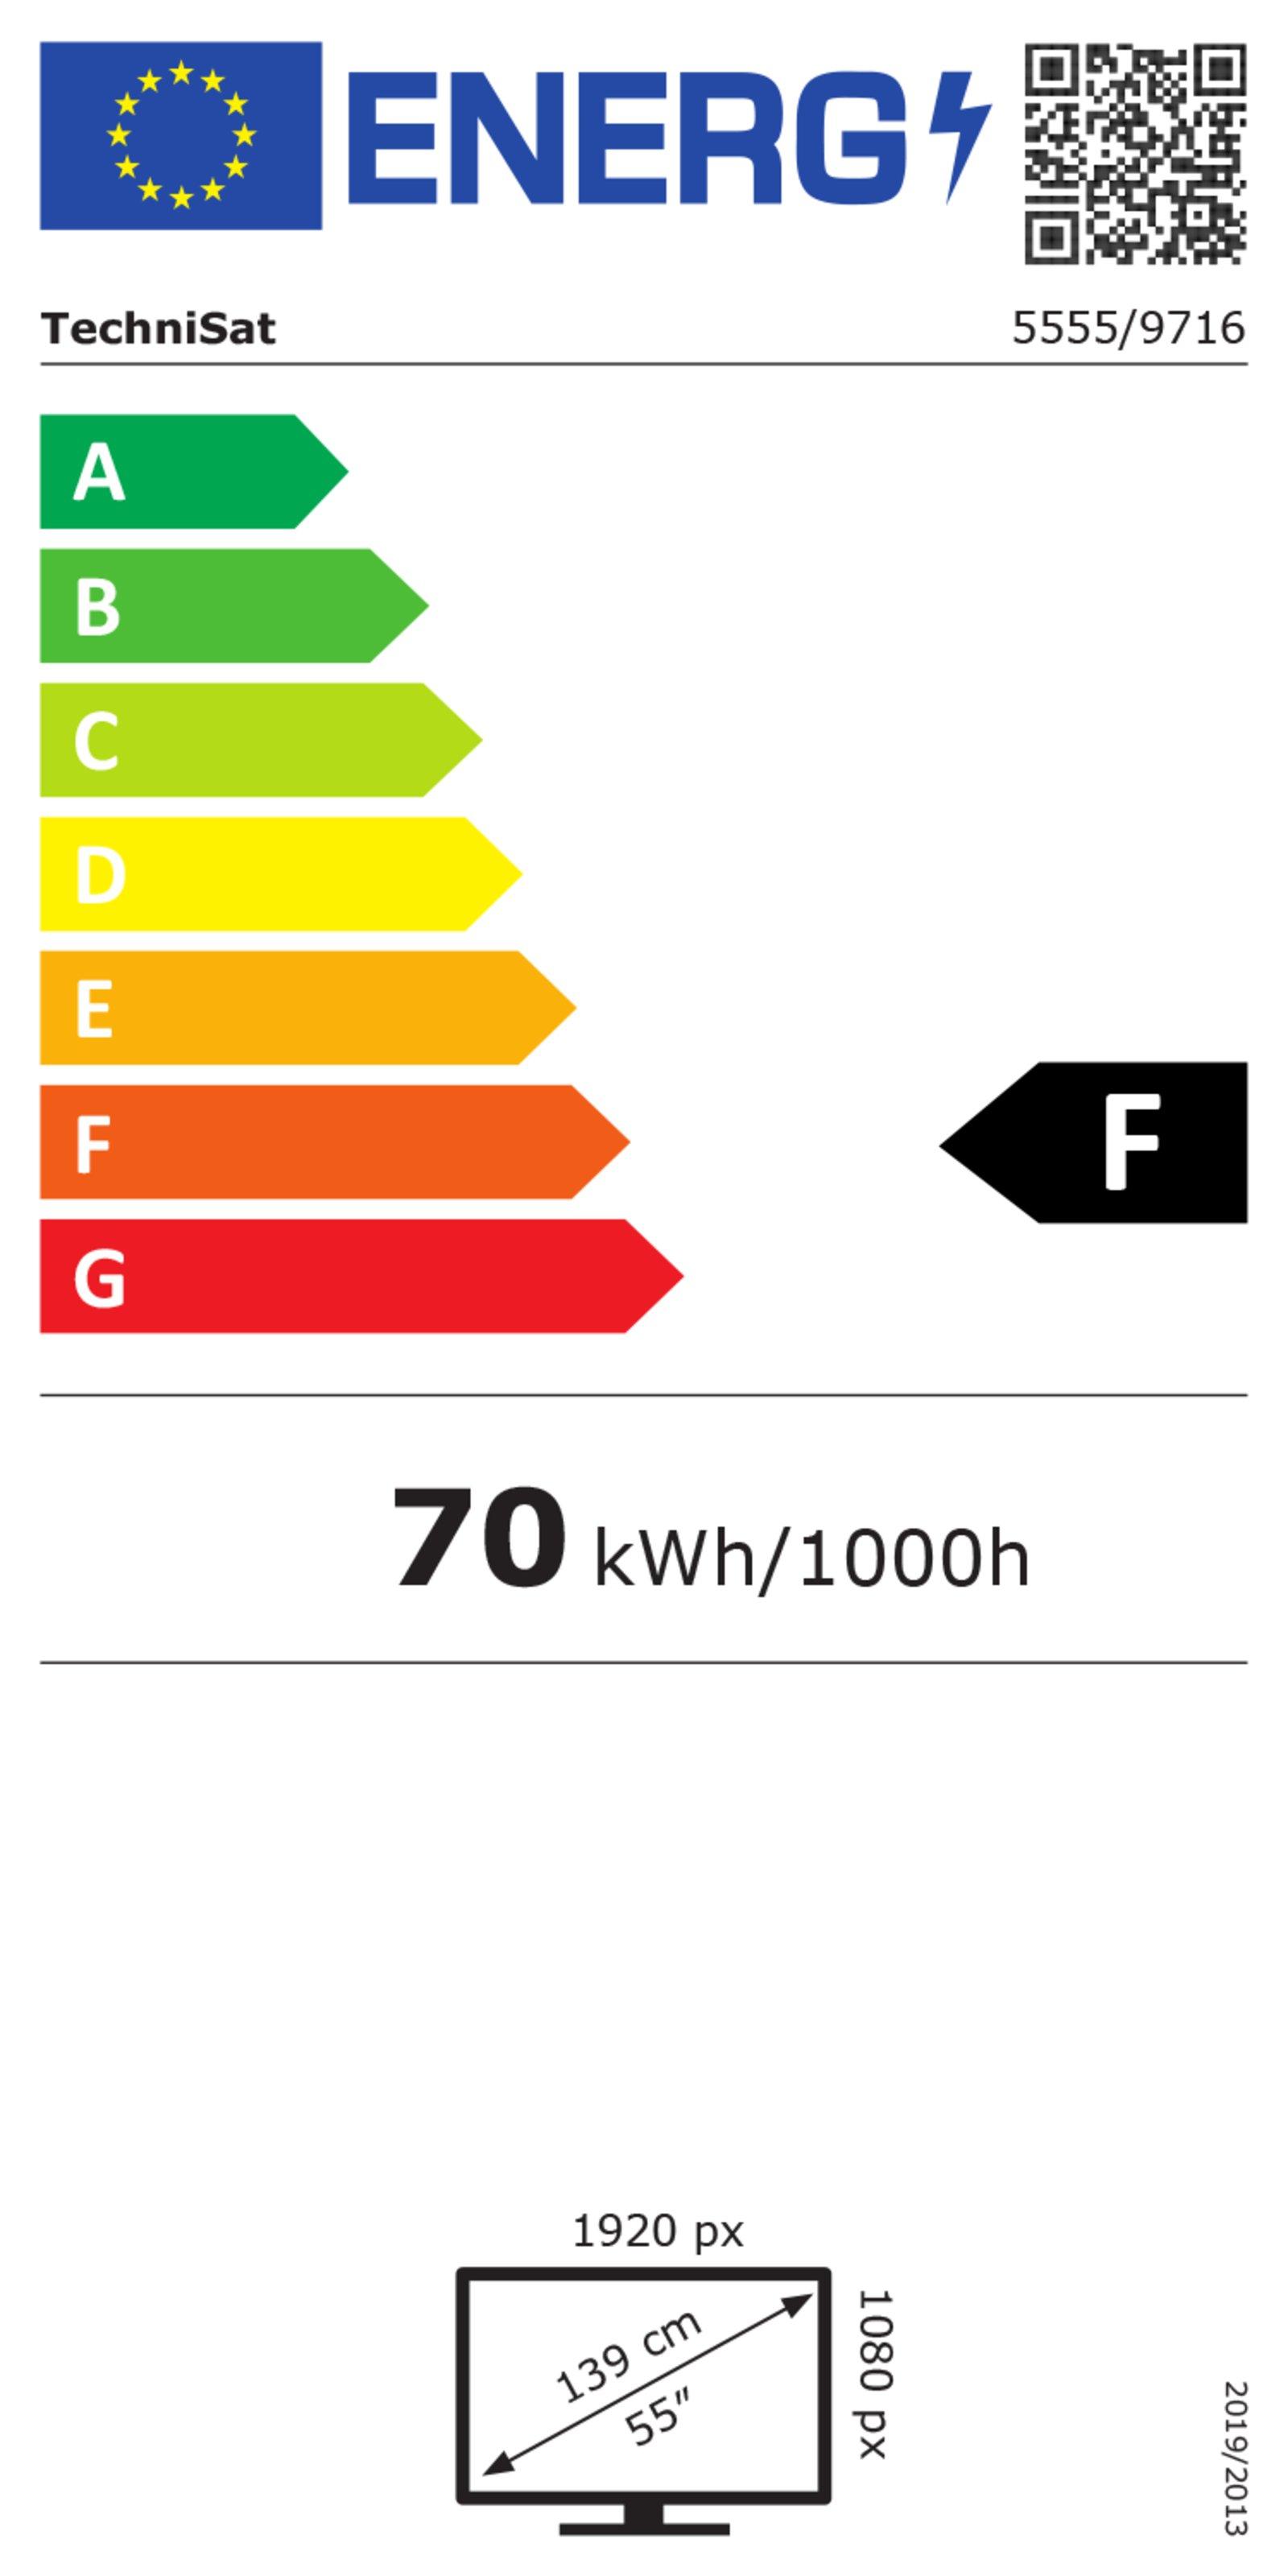 Energieeffizienzlabel